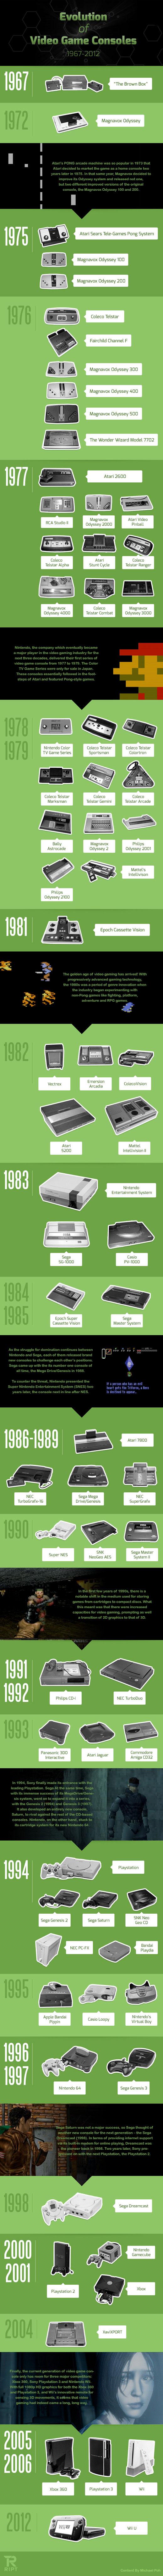 Evolucion consolas